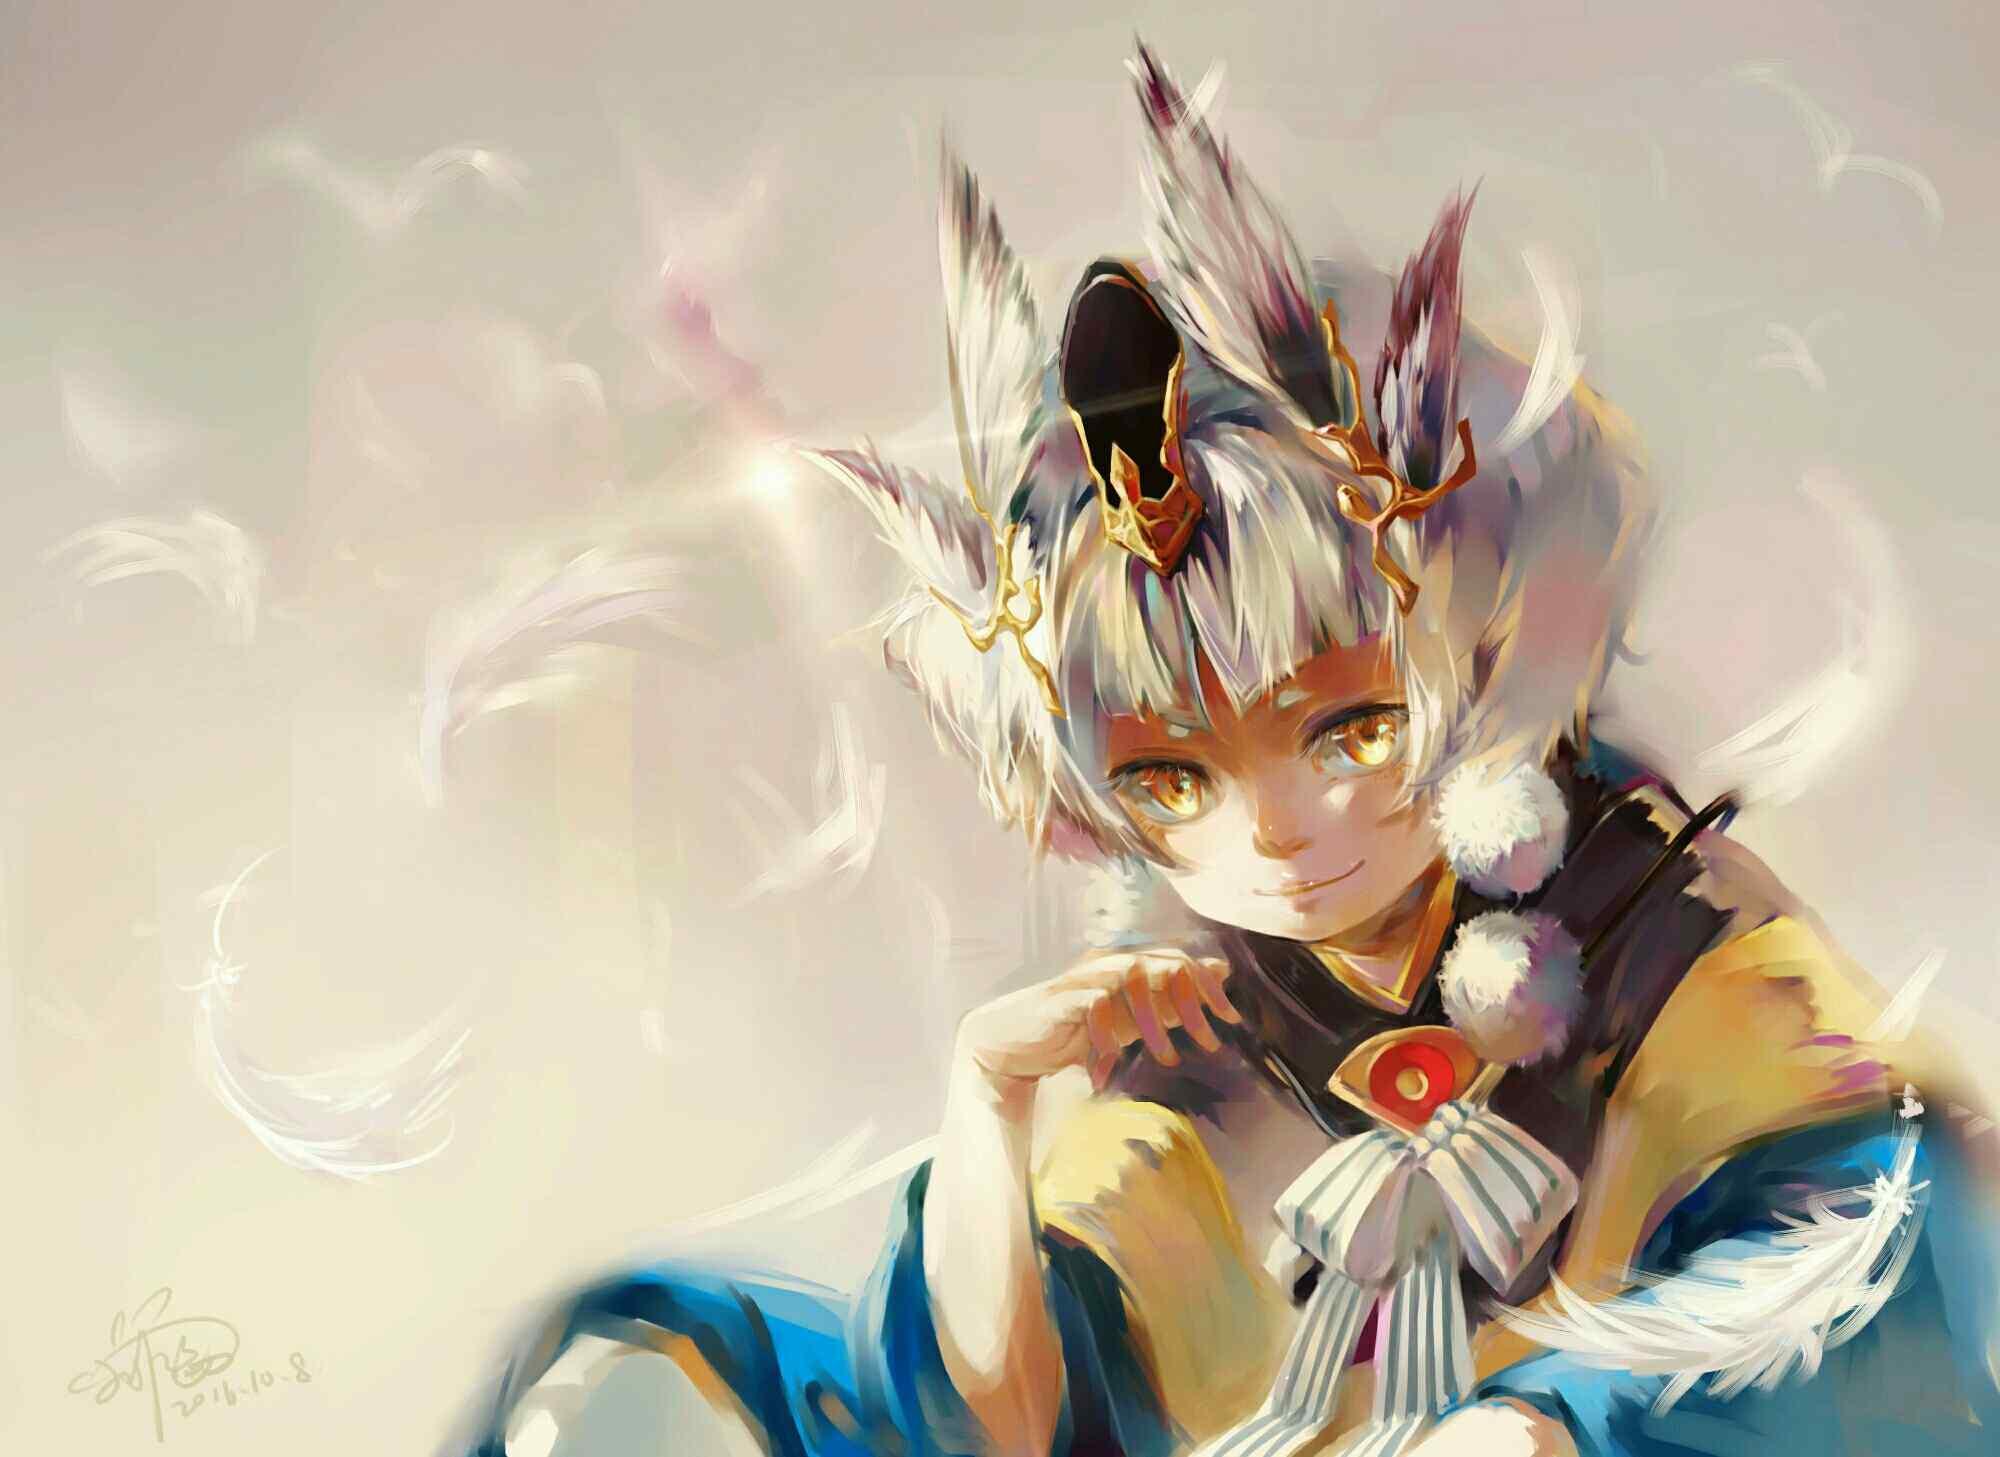 Win8 3d Wallpaper 阴阳师手游游戏壁纸之可爱的童男式神 桌面天下(desktx Com)